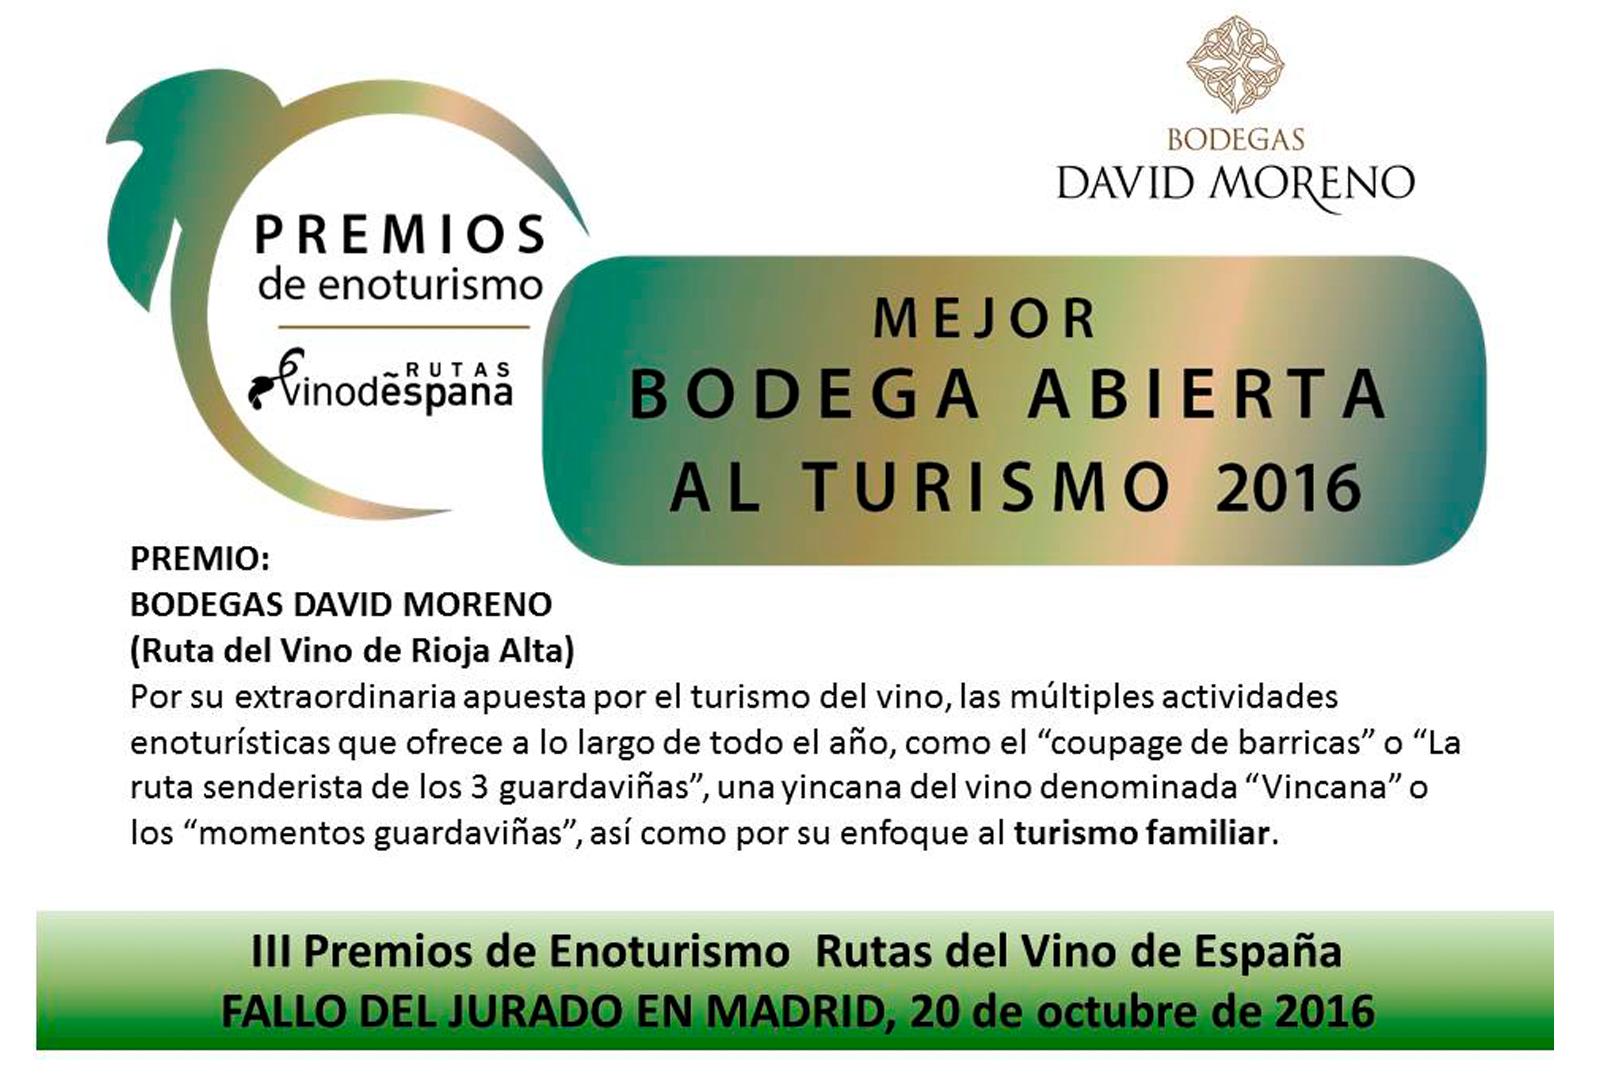 Bodegas David Moreno gana el premio a Mejor Bodega Abierta al Turismo.